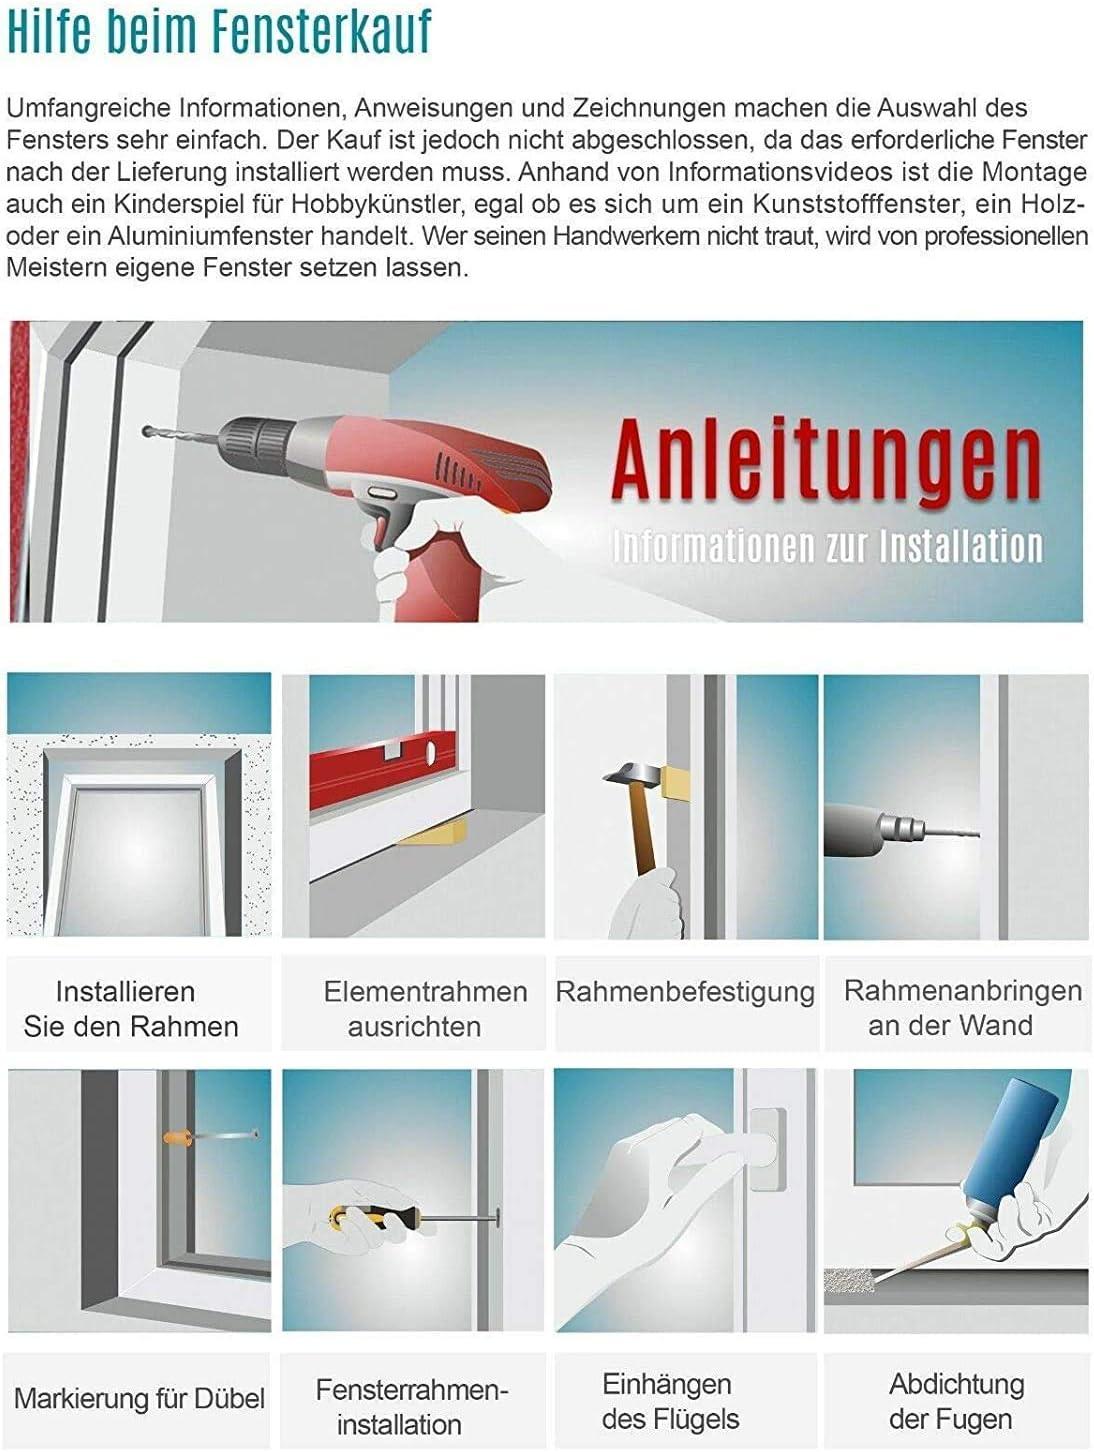 BxH:105x65 cm DIN Rechts 3 fach Verglasung Dreh-Kipp ALLE GR/Ö/ßEN Fenster Kellerfenster Kunststofffenster wei/ß Premium